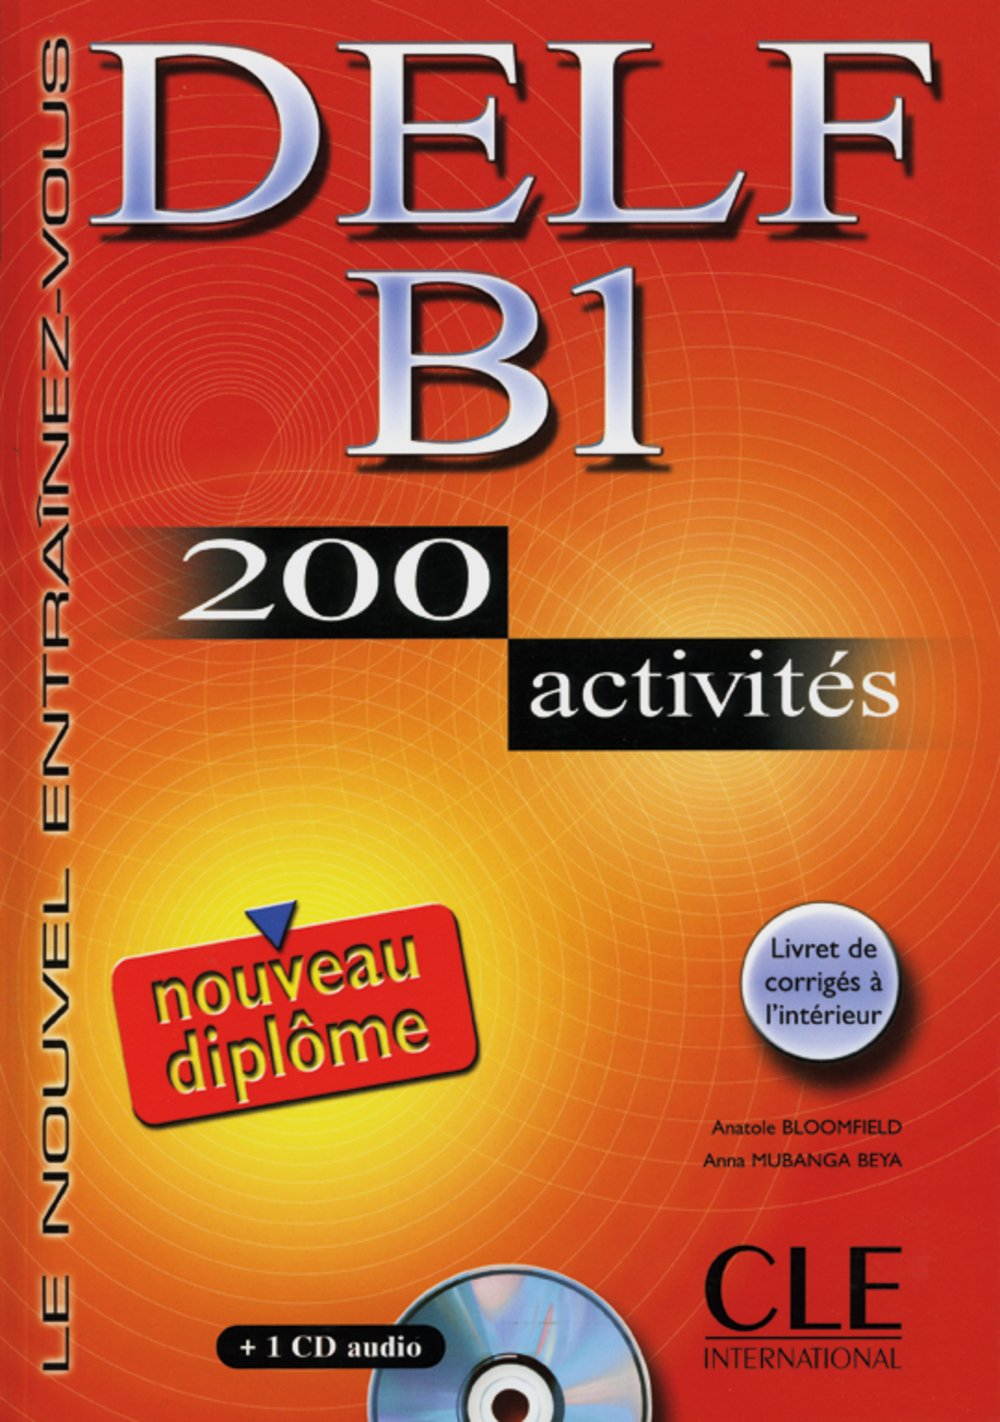 DELF B1: 200 activités. Livre + corrigés + CD audio